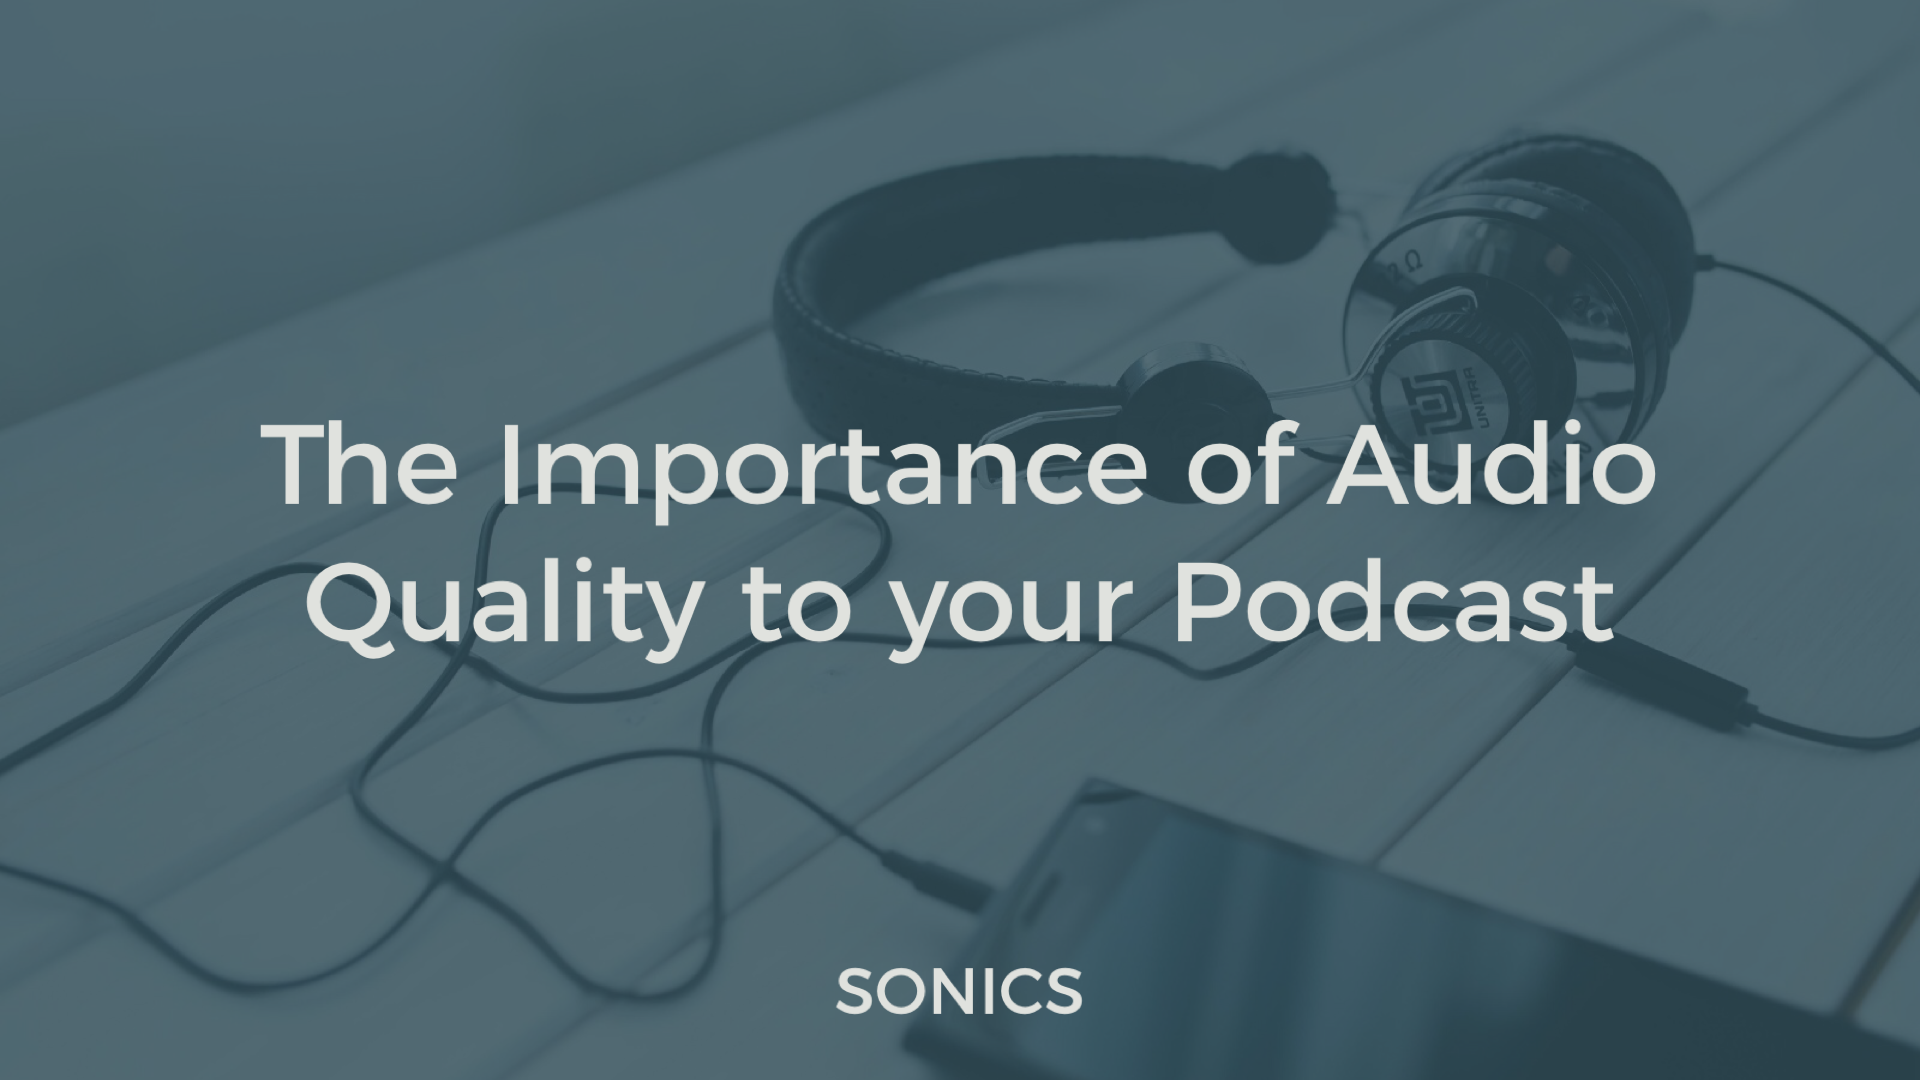 Audio quality podcasts